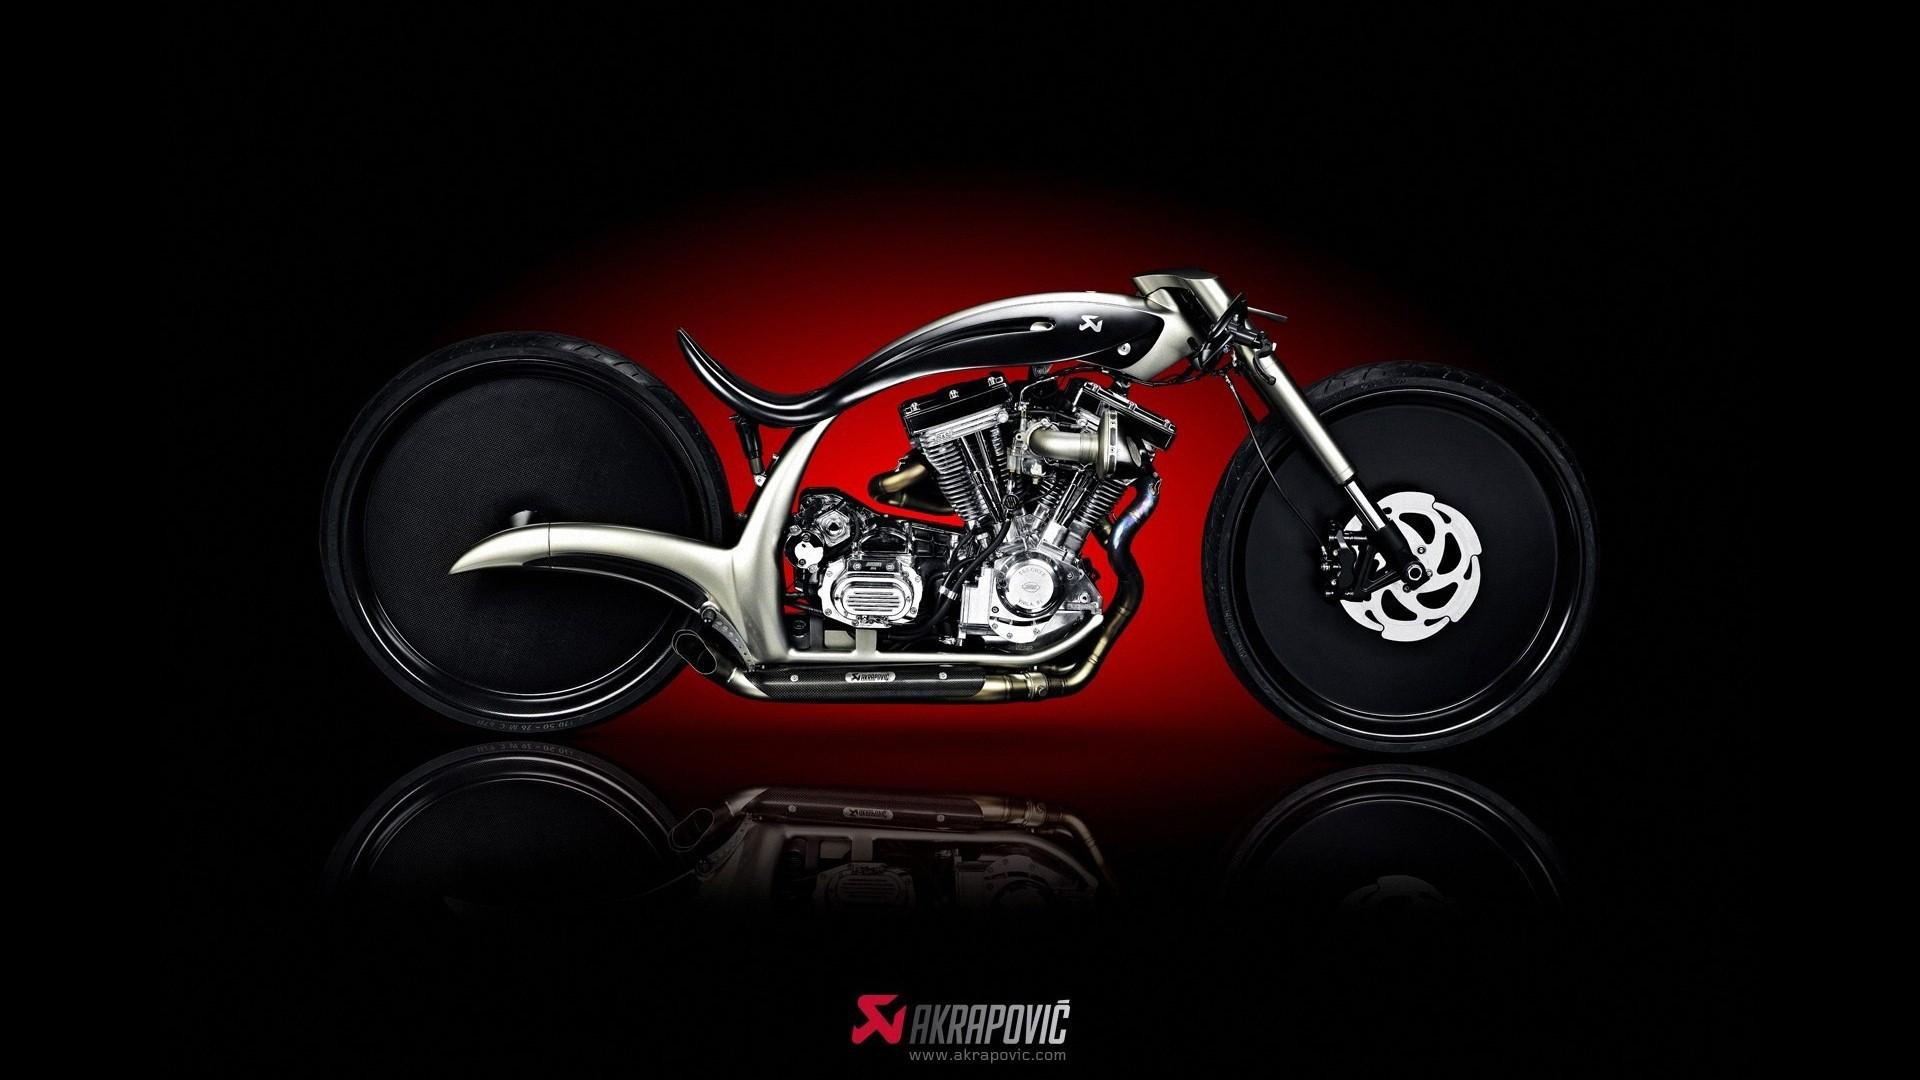 1920x1080 Harley Davidson Hd Wallpapers 1080p High Quality